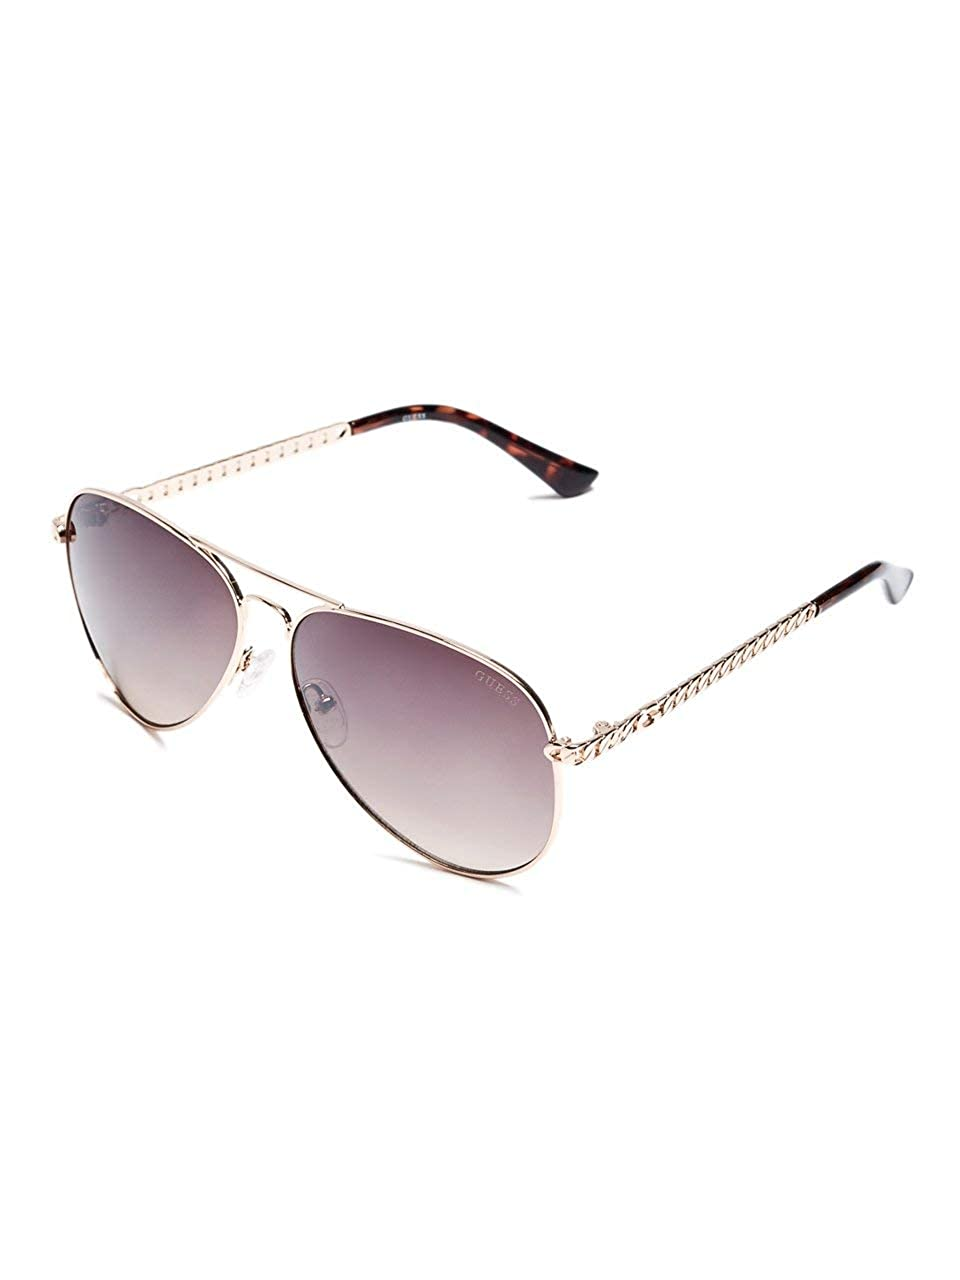 b1545743bf26 Amazon.com: GUESS Factory Women's Metal Chain-Link Aviator Sunglasses:  Clothing